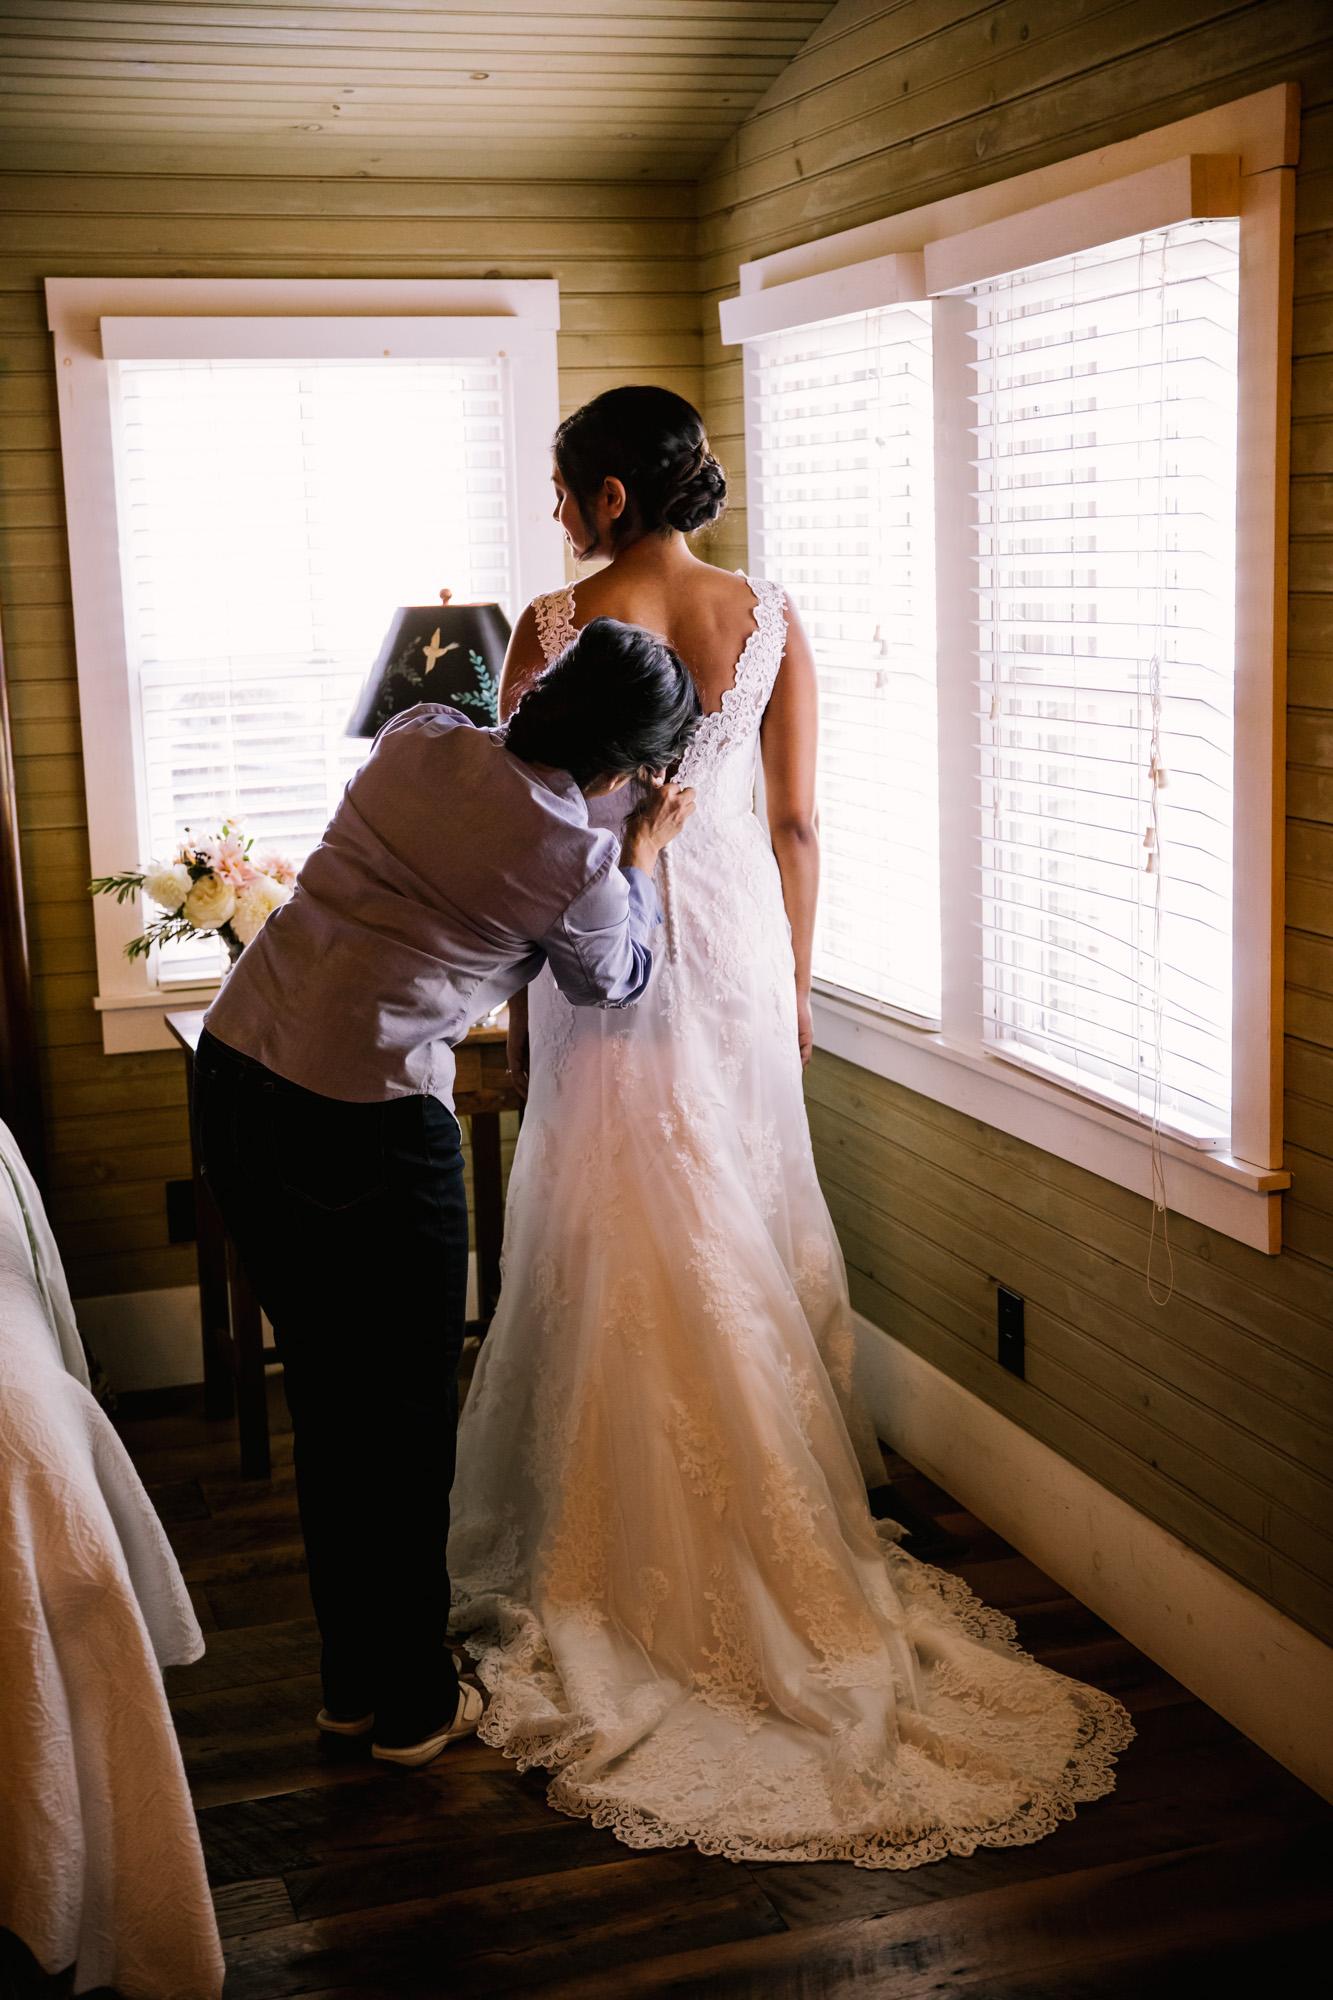 Waynesville NC Wedding Photography | Bridal Preparation